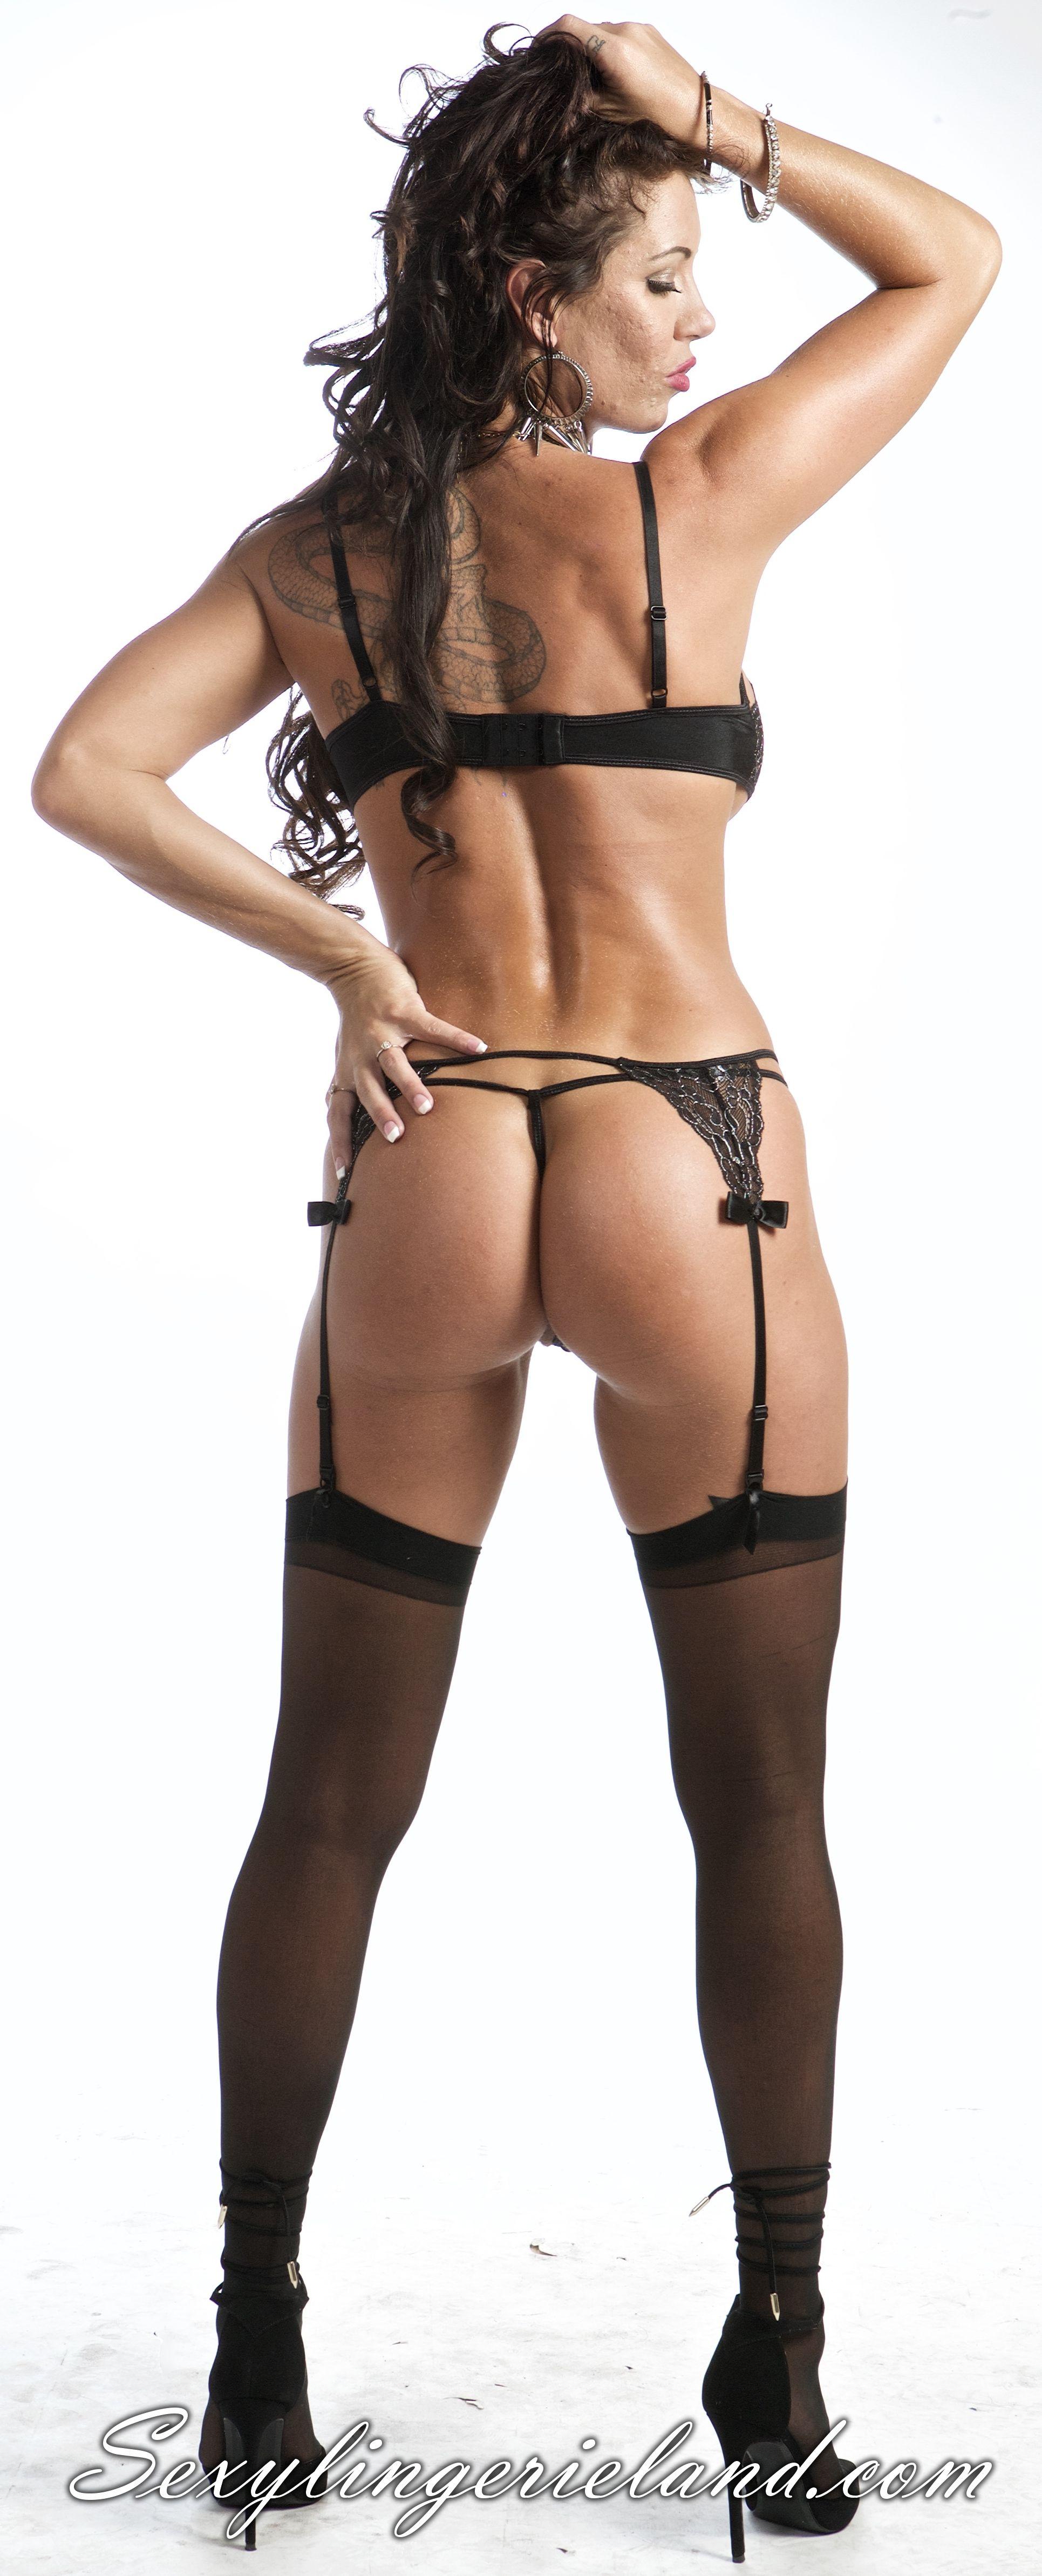 92e9cf120f520 EM-5490 Erotic black lingerie set